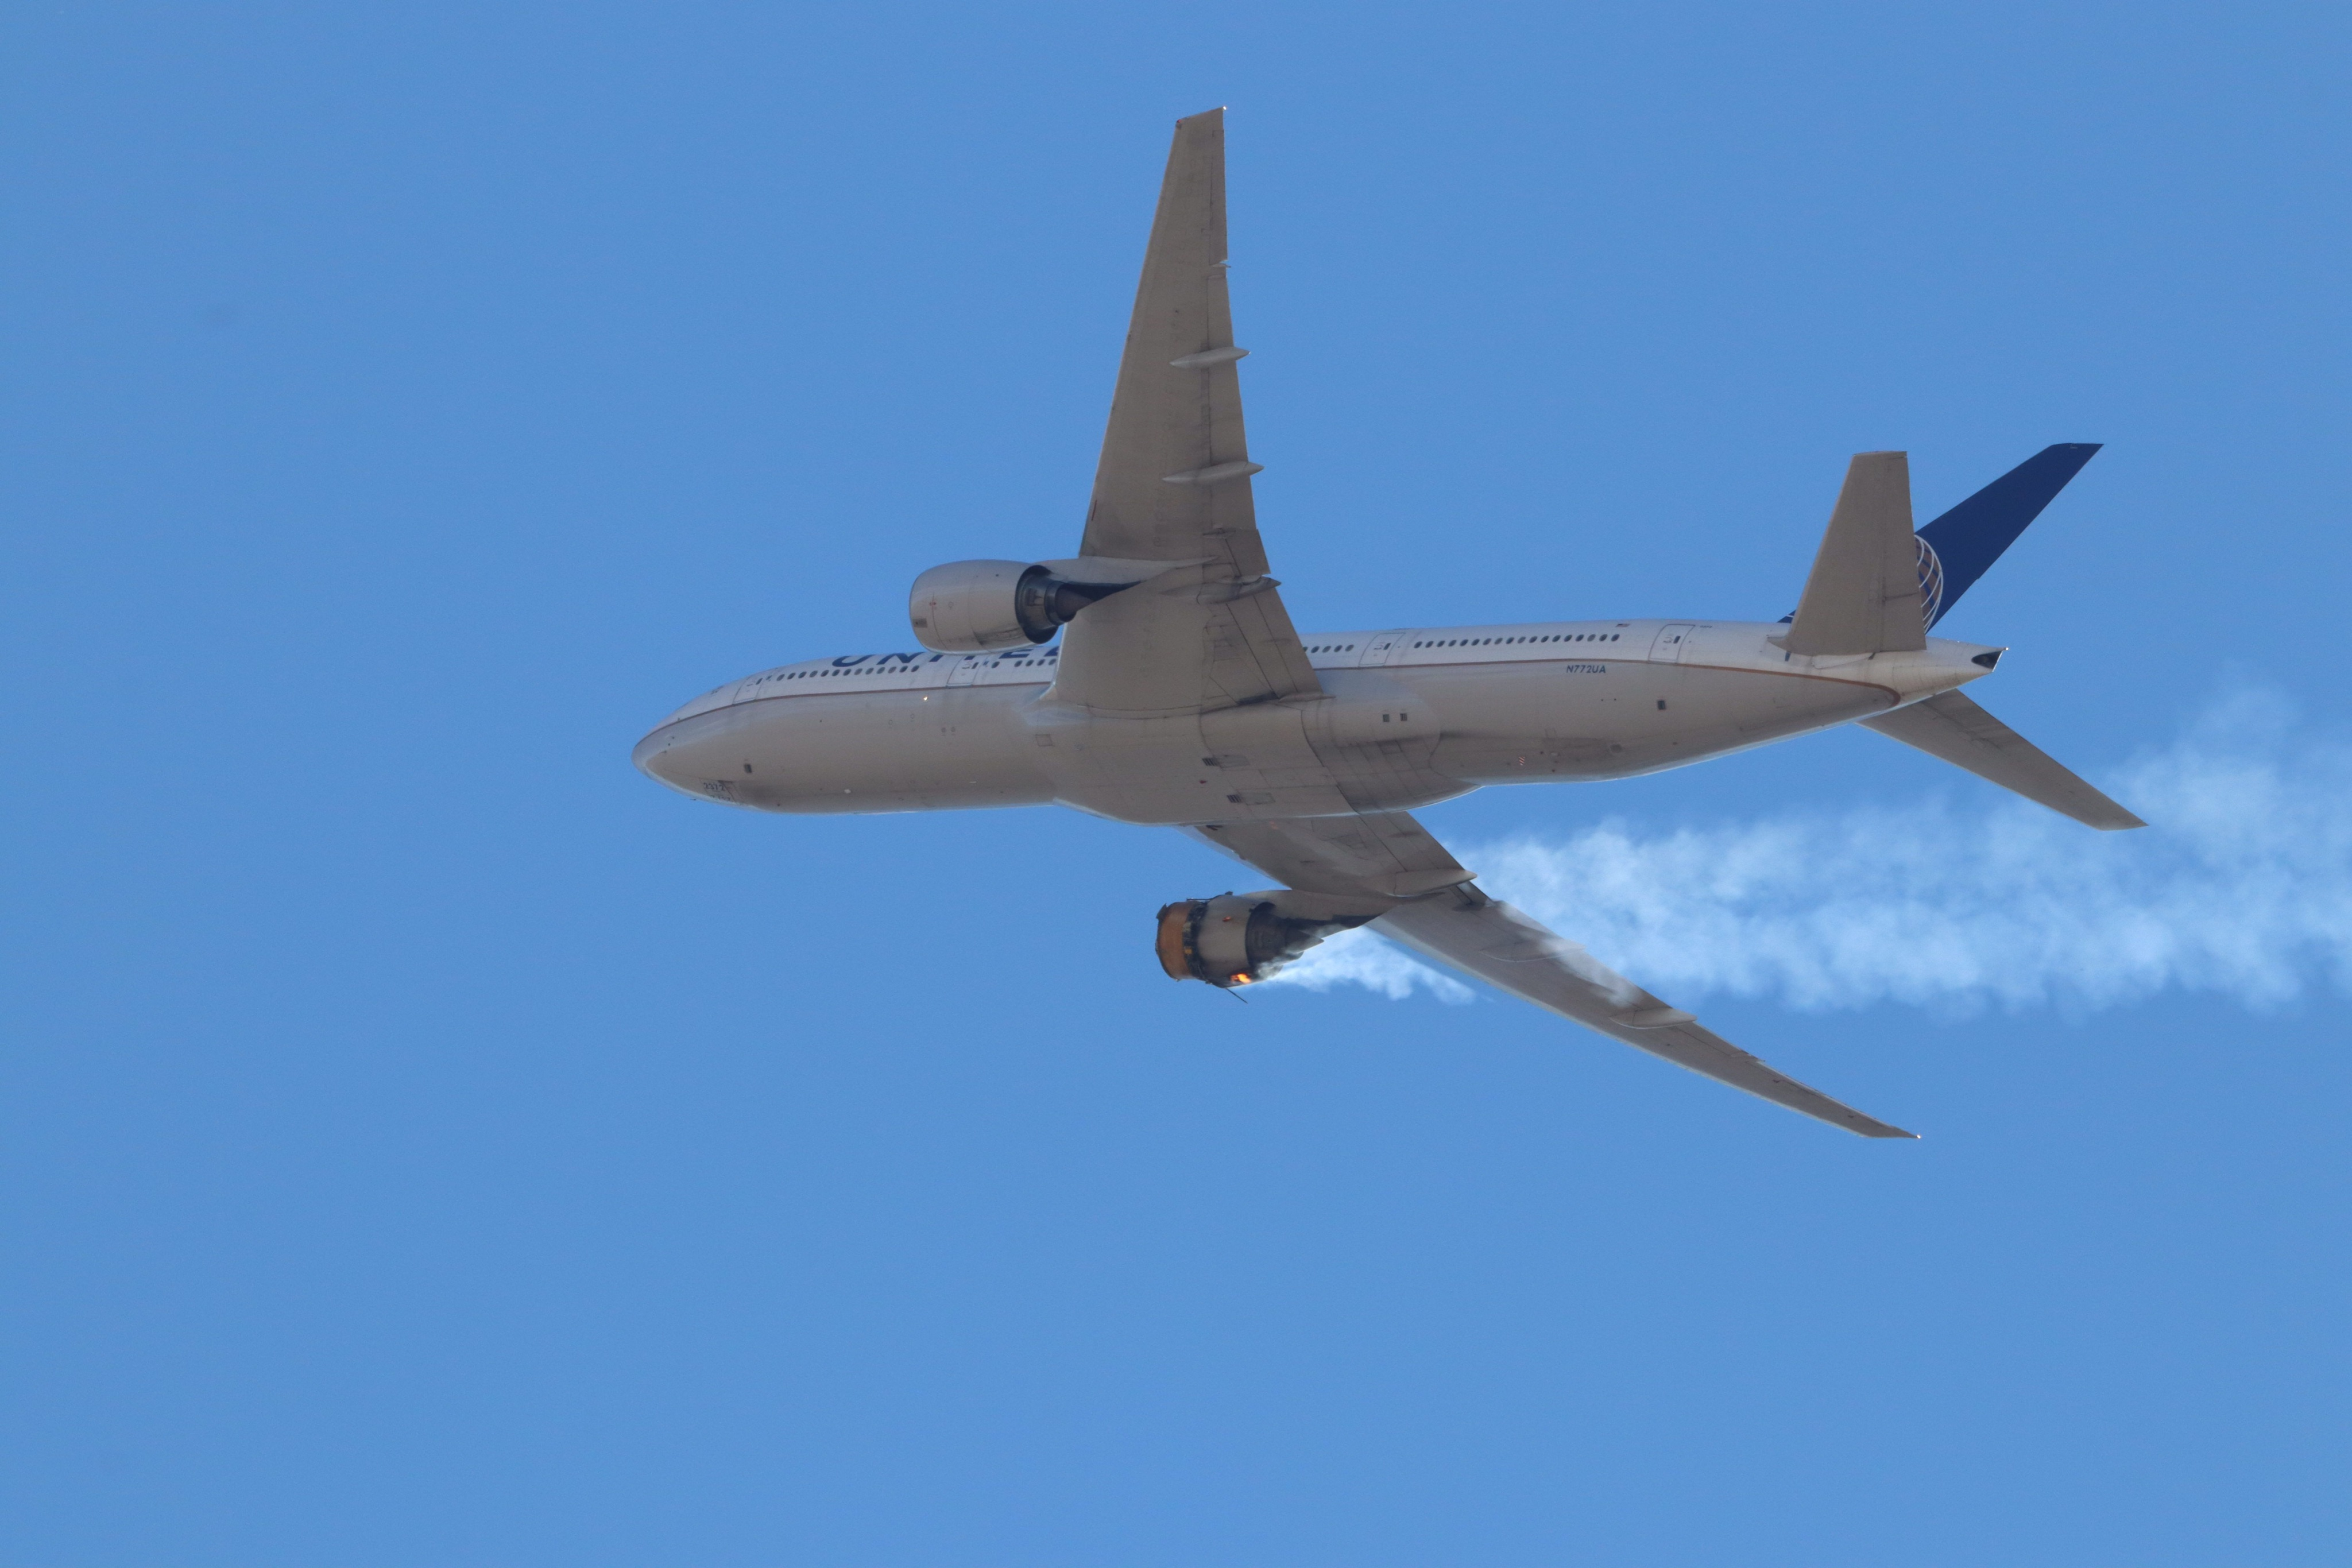 United Airlines UA328 med brand i højre motor. (Foto: Hayden Smith | Speedbird5280 Instagram)